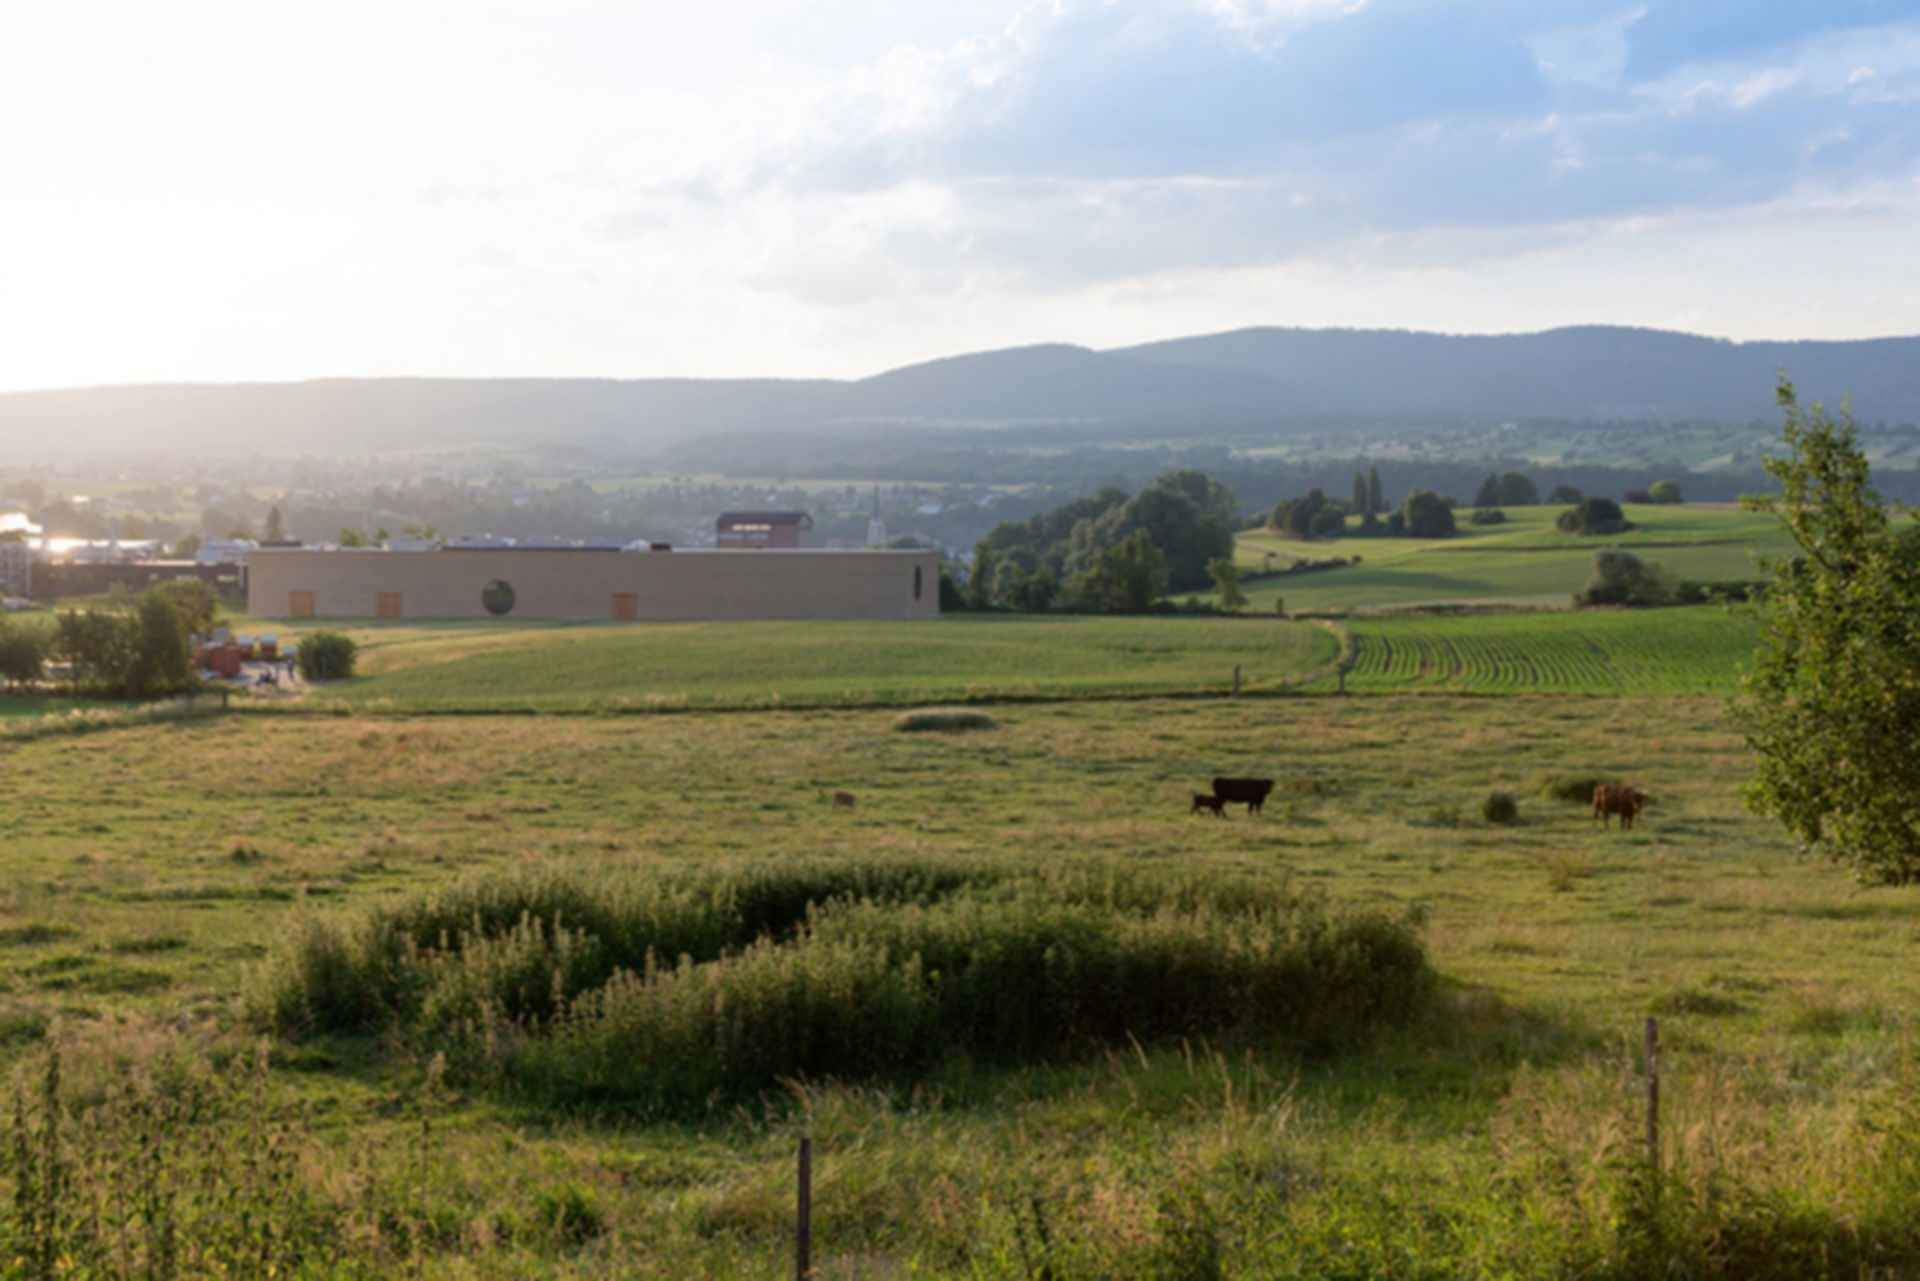 Ricola Krauterzentrum - exterior landscape